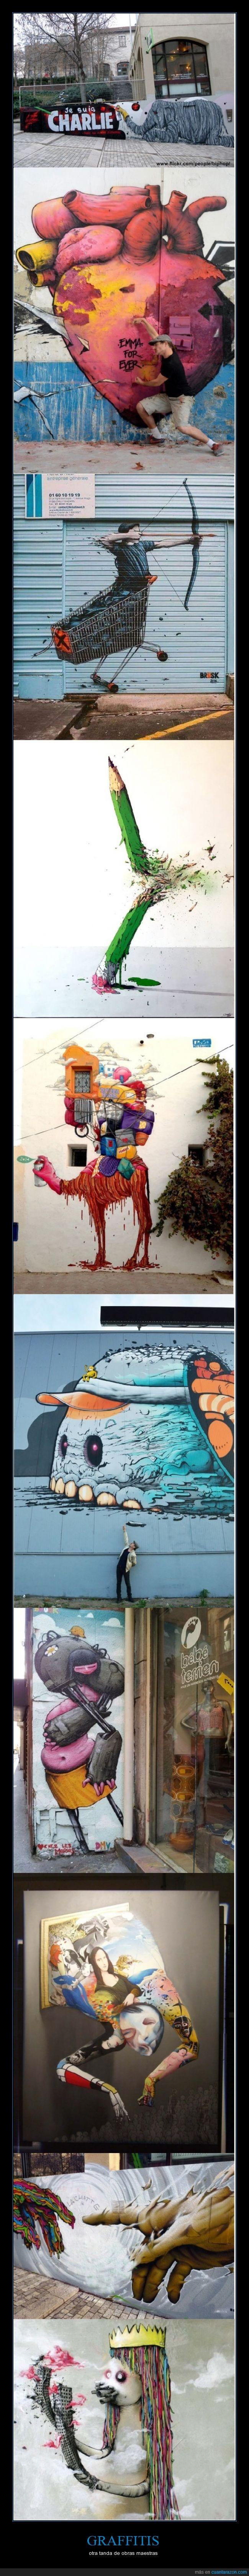 arte,arte urbano,artistas,bardas,brush,calles,graffiti,muros,pintura